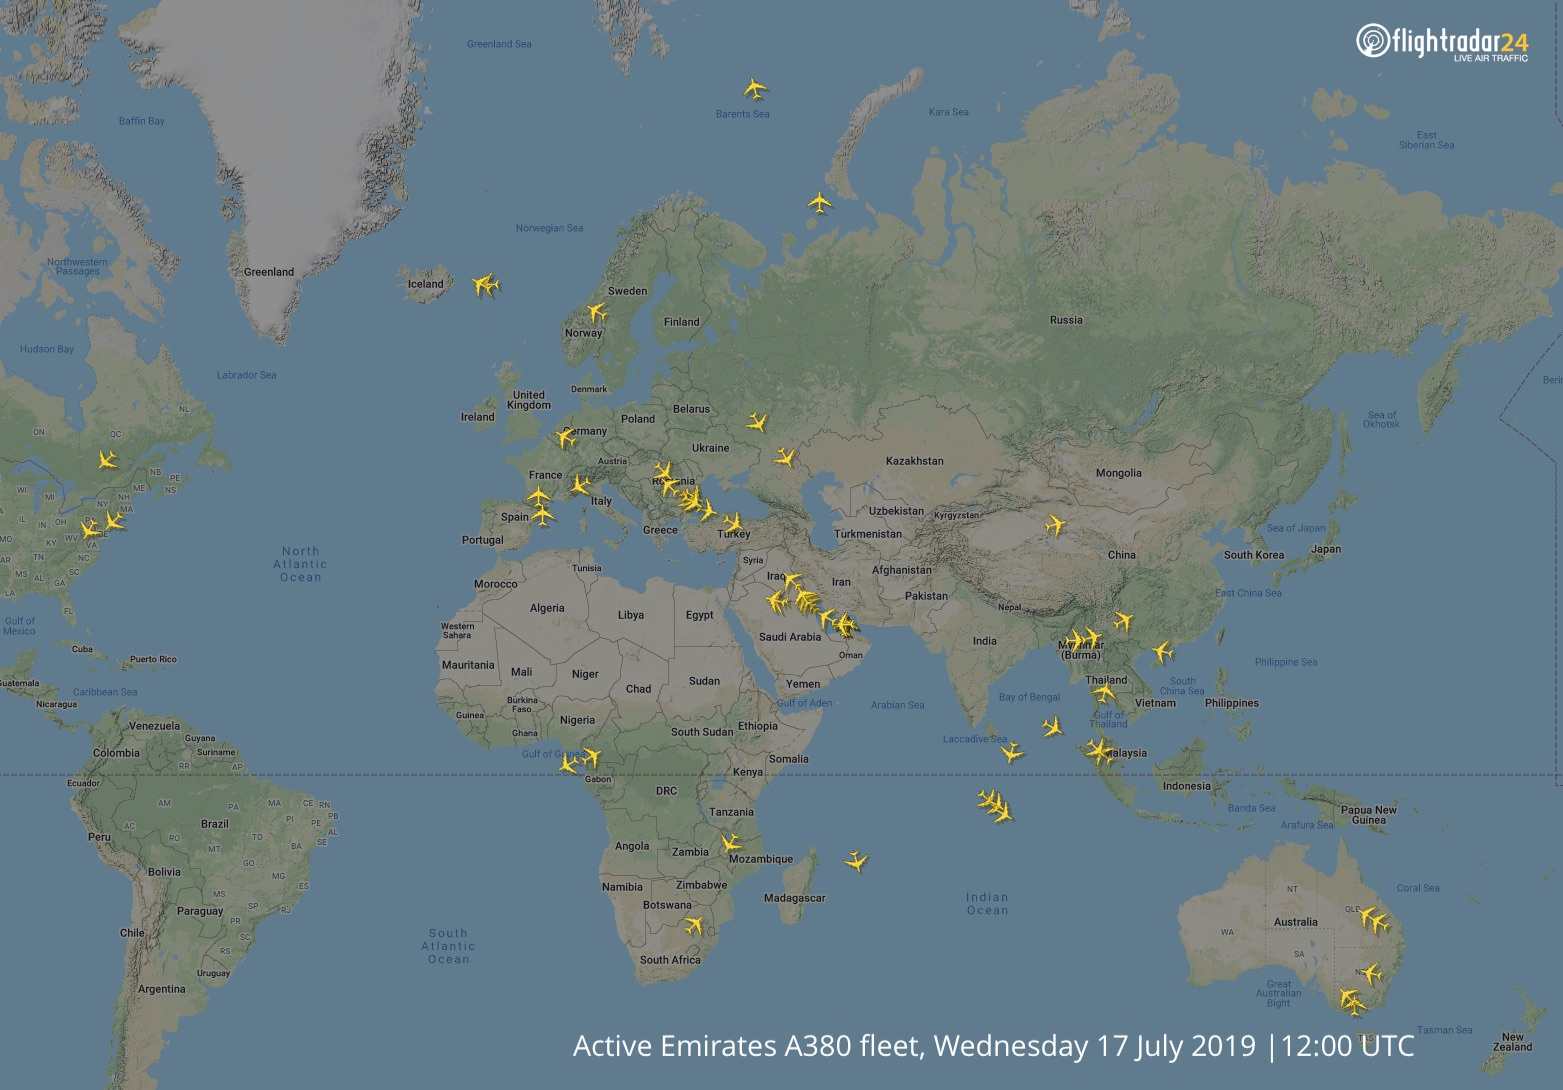 The Emirates A380 fleet mid-July 2019